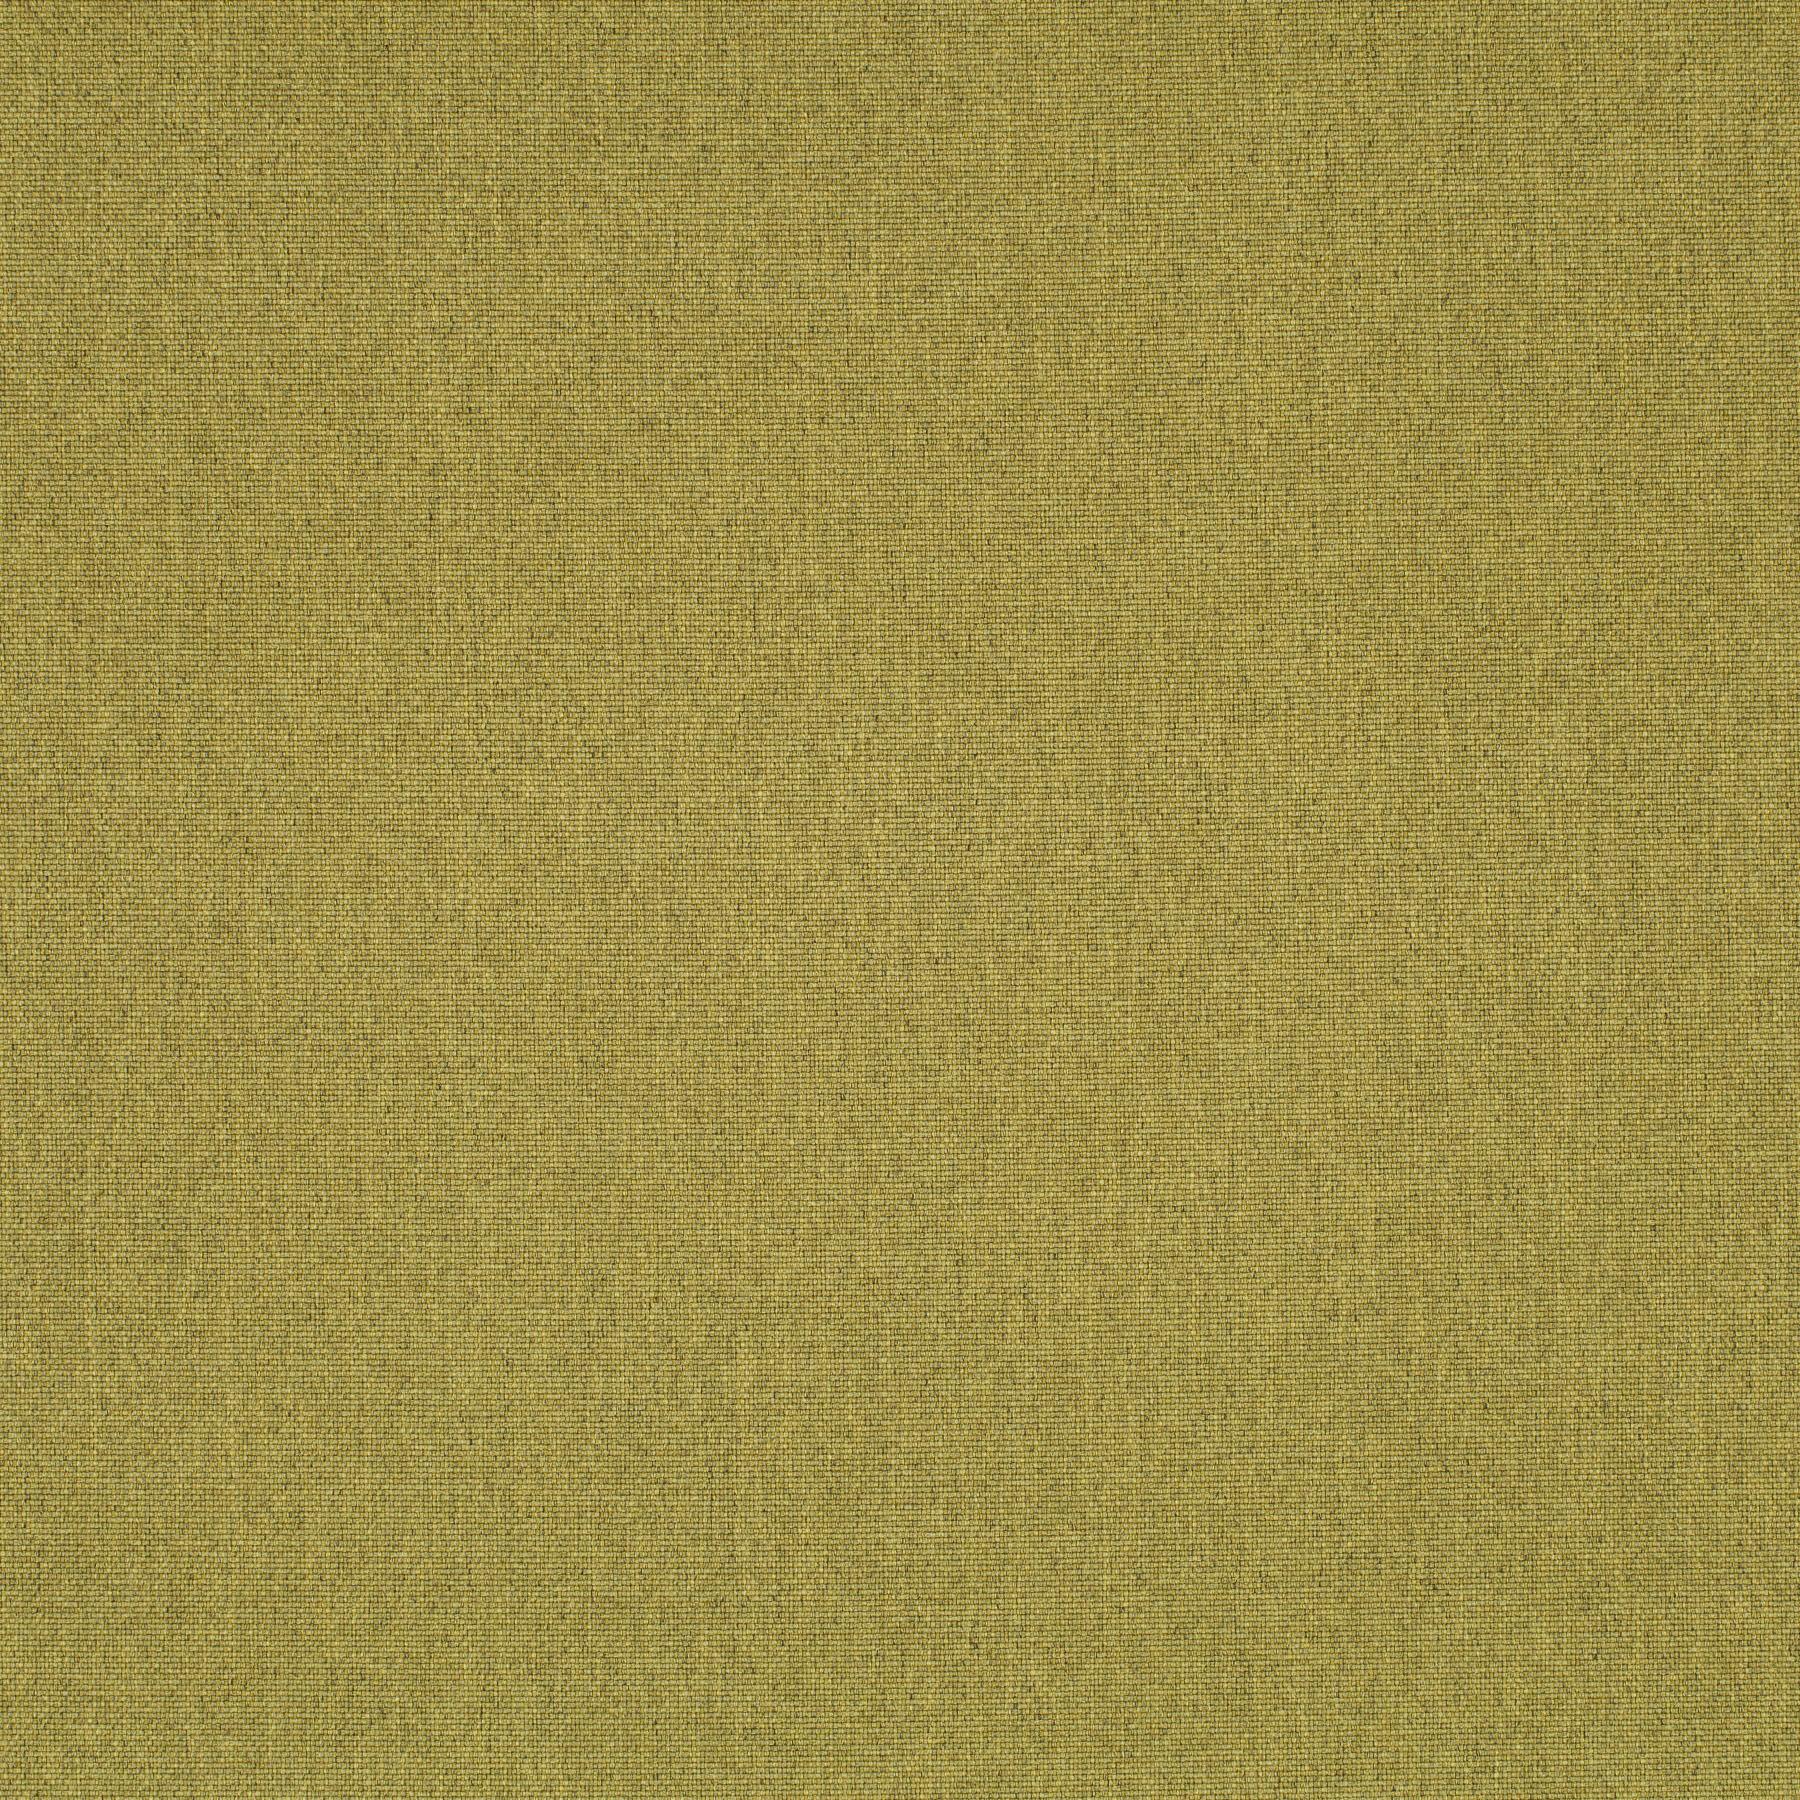 decoration fabric humphrey vol 2 1 6360 133 jab anstoetz. Black Bedroom Furniture Sets. Home Design Ideas